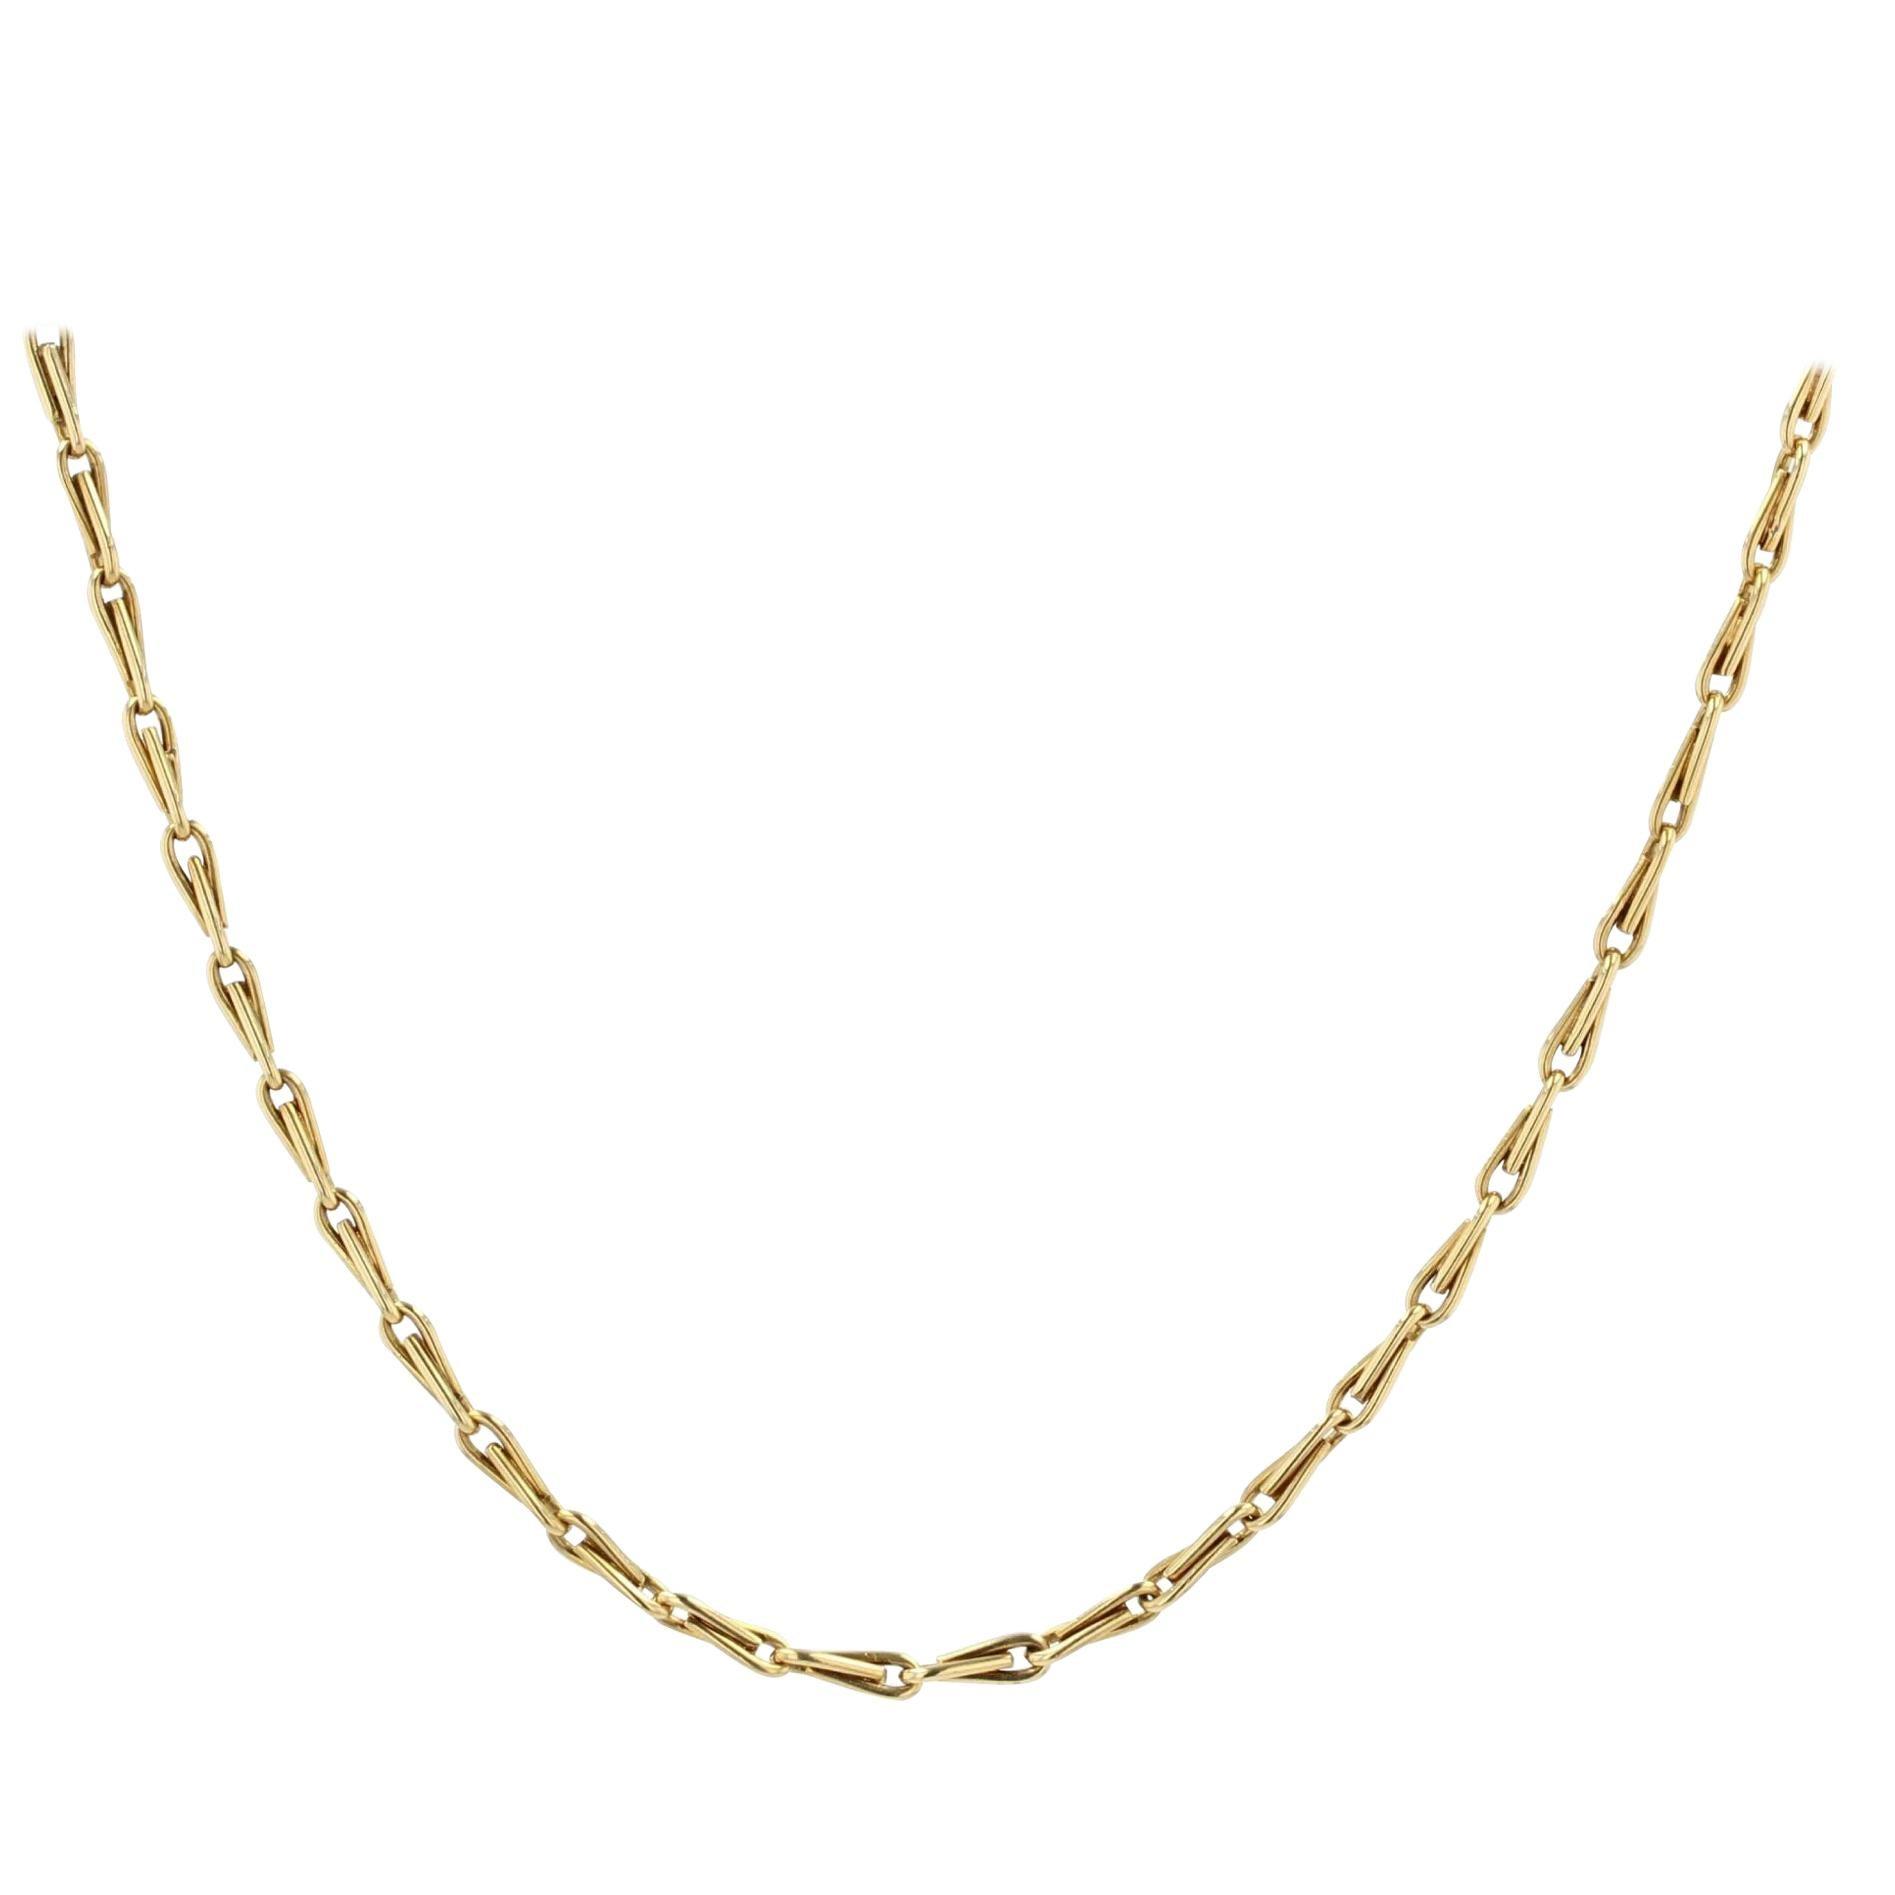 French 19th Century 18 Karat Yellow Gold Watch Chain